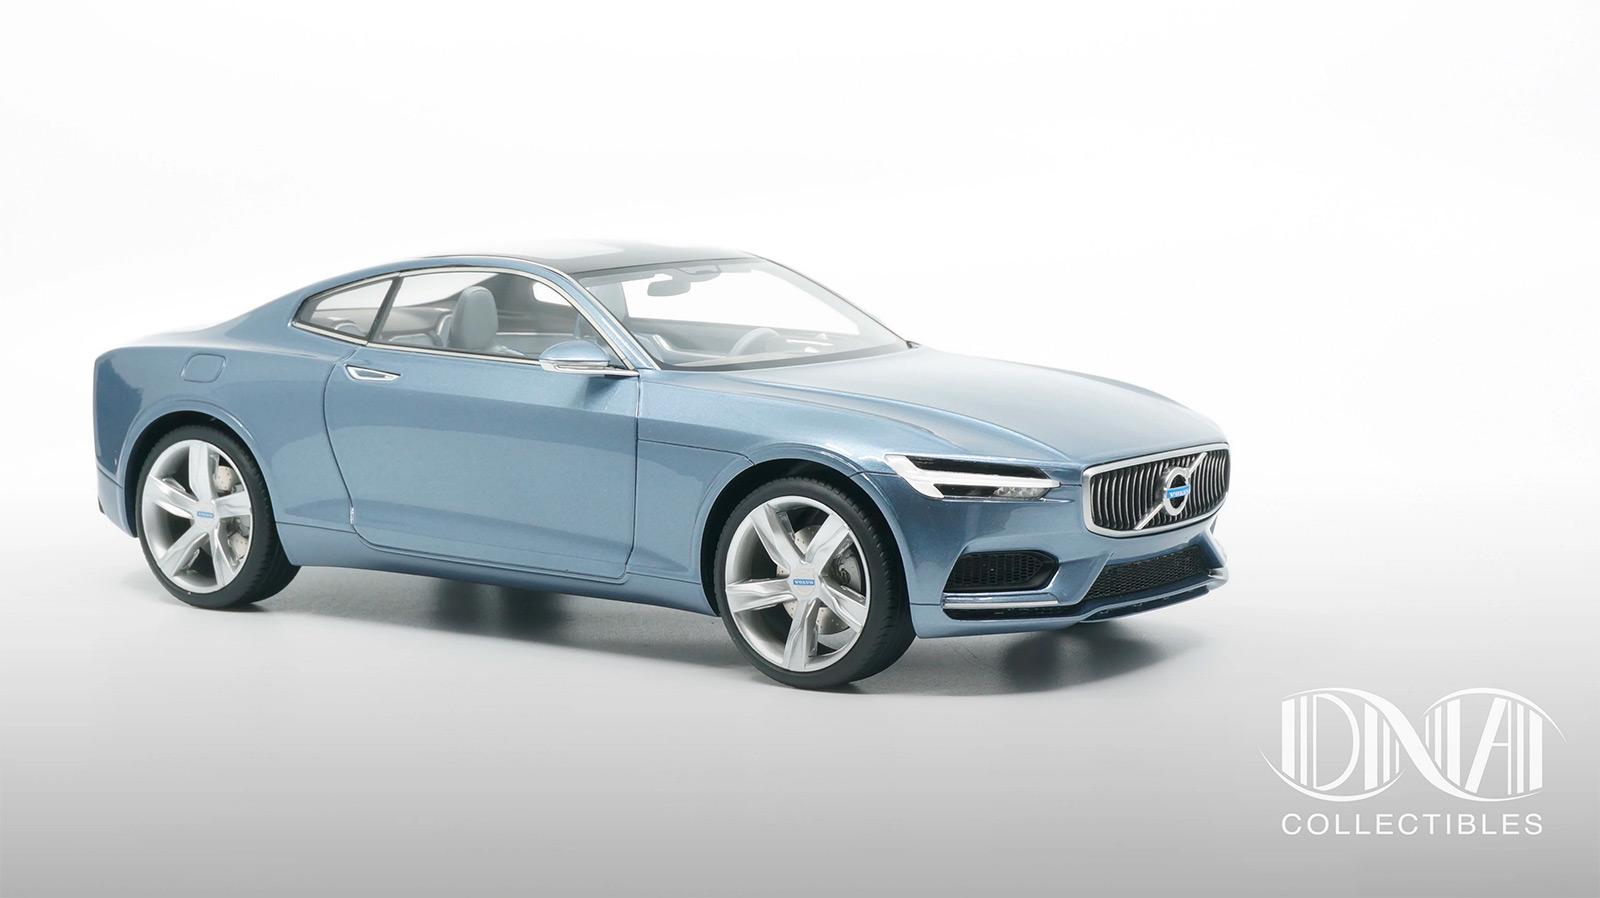 Commander la Volvo Concept Coupé DNA Collectibles 1/18